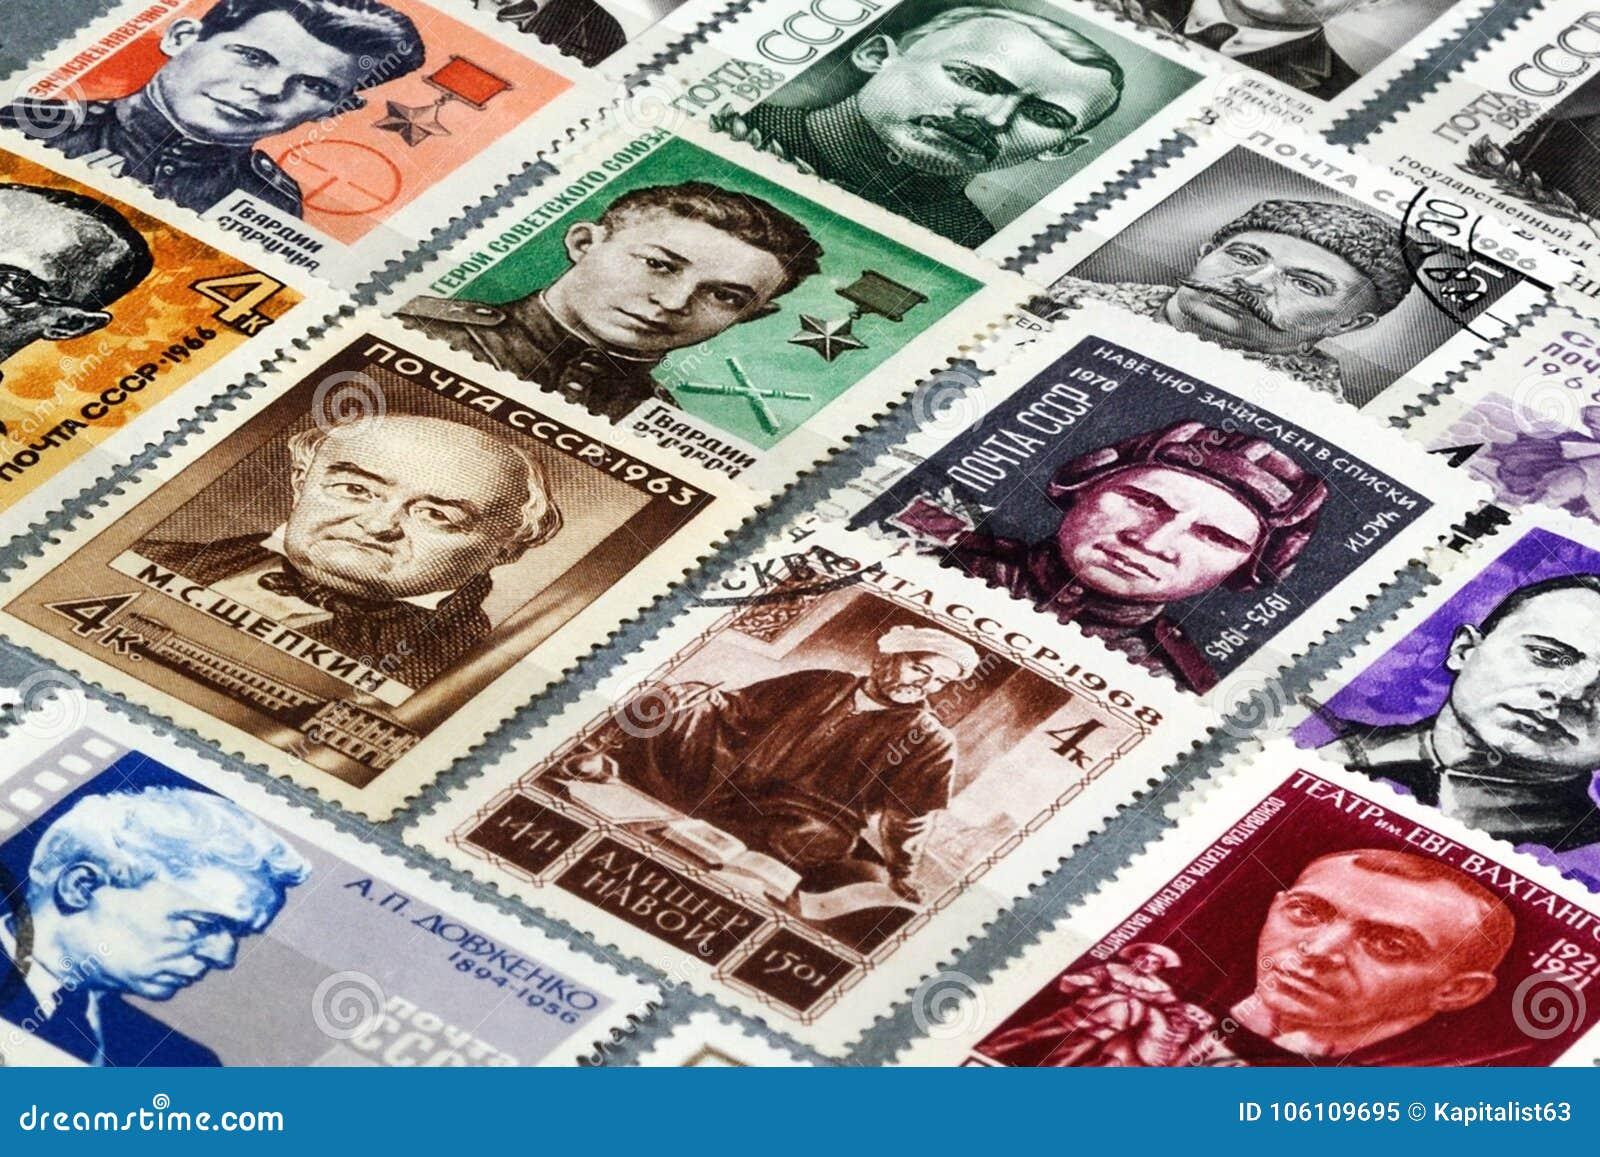 Vintage postage stamps of the USSR